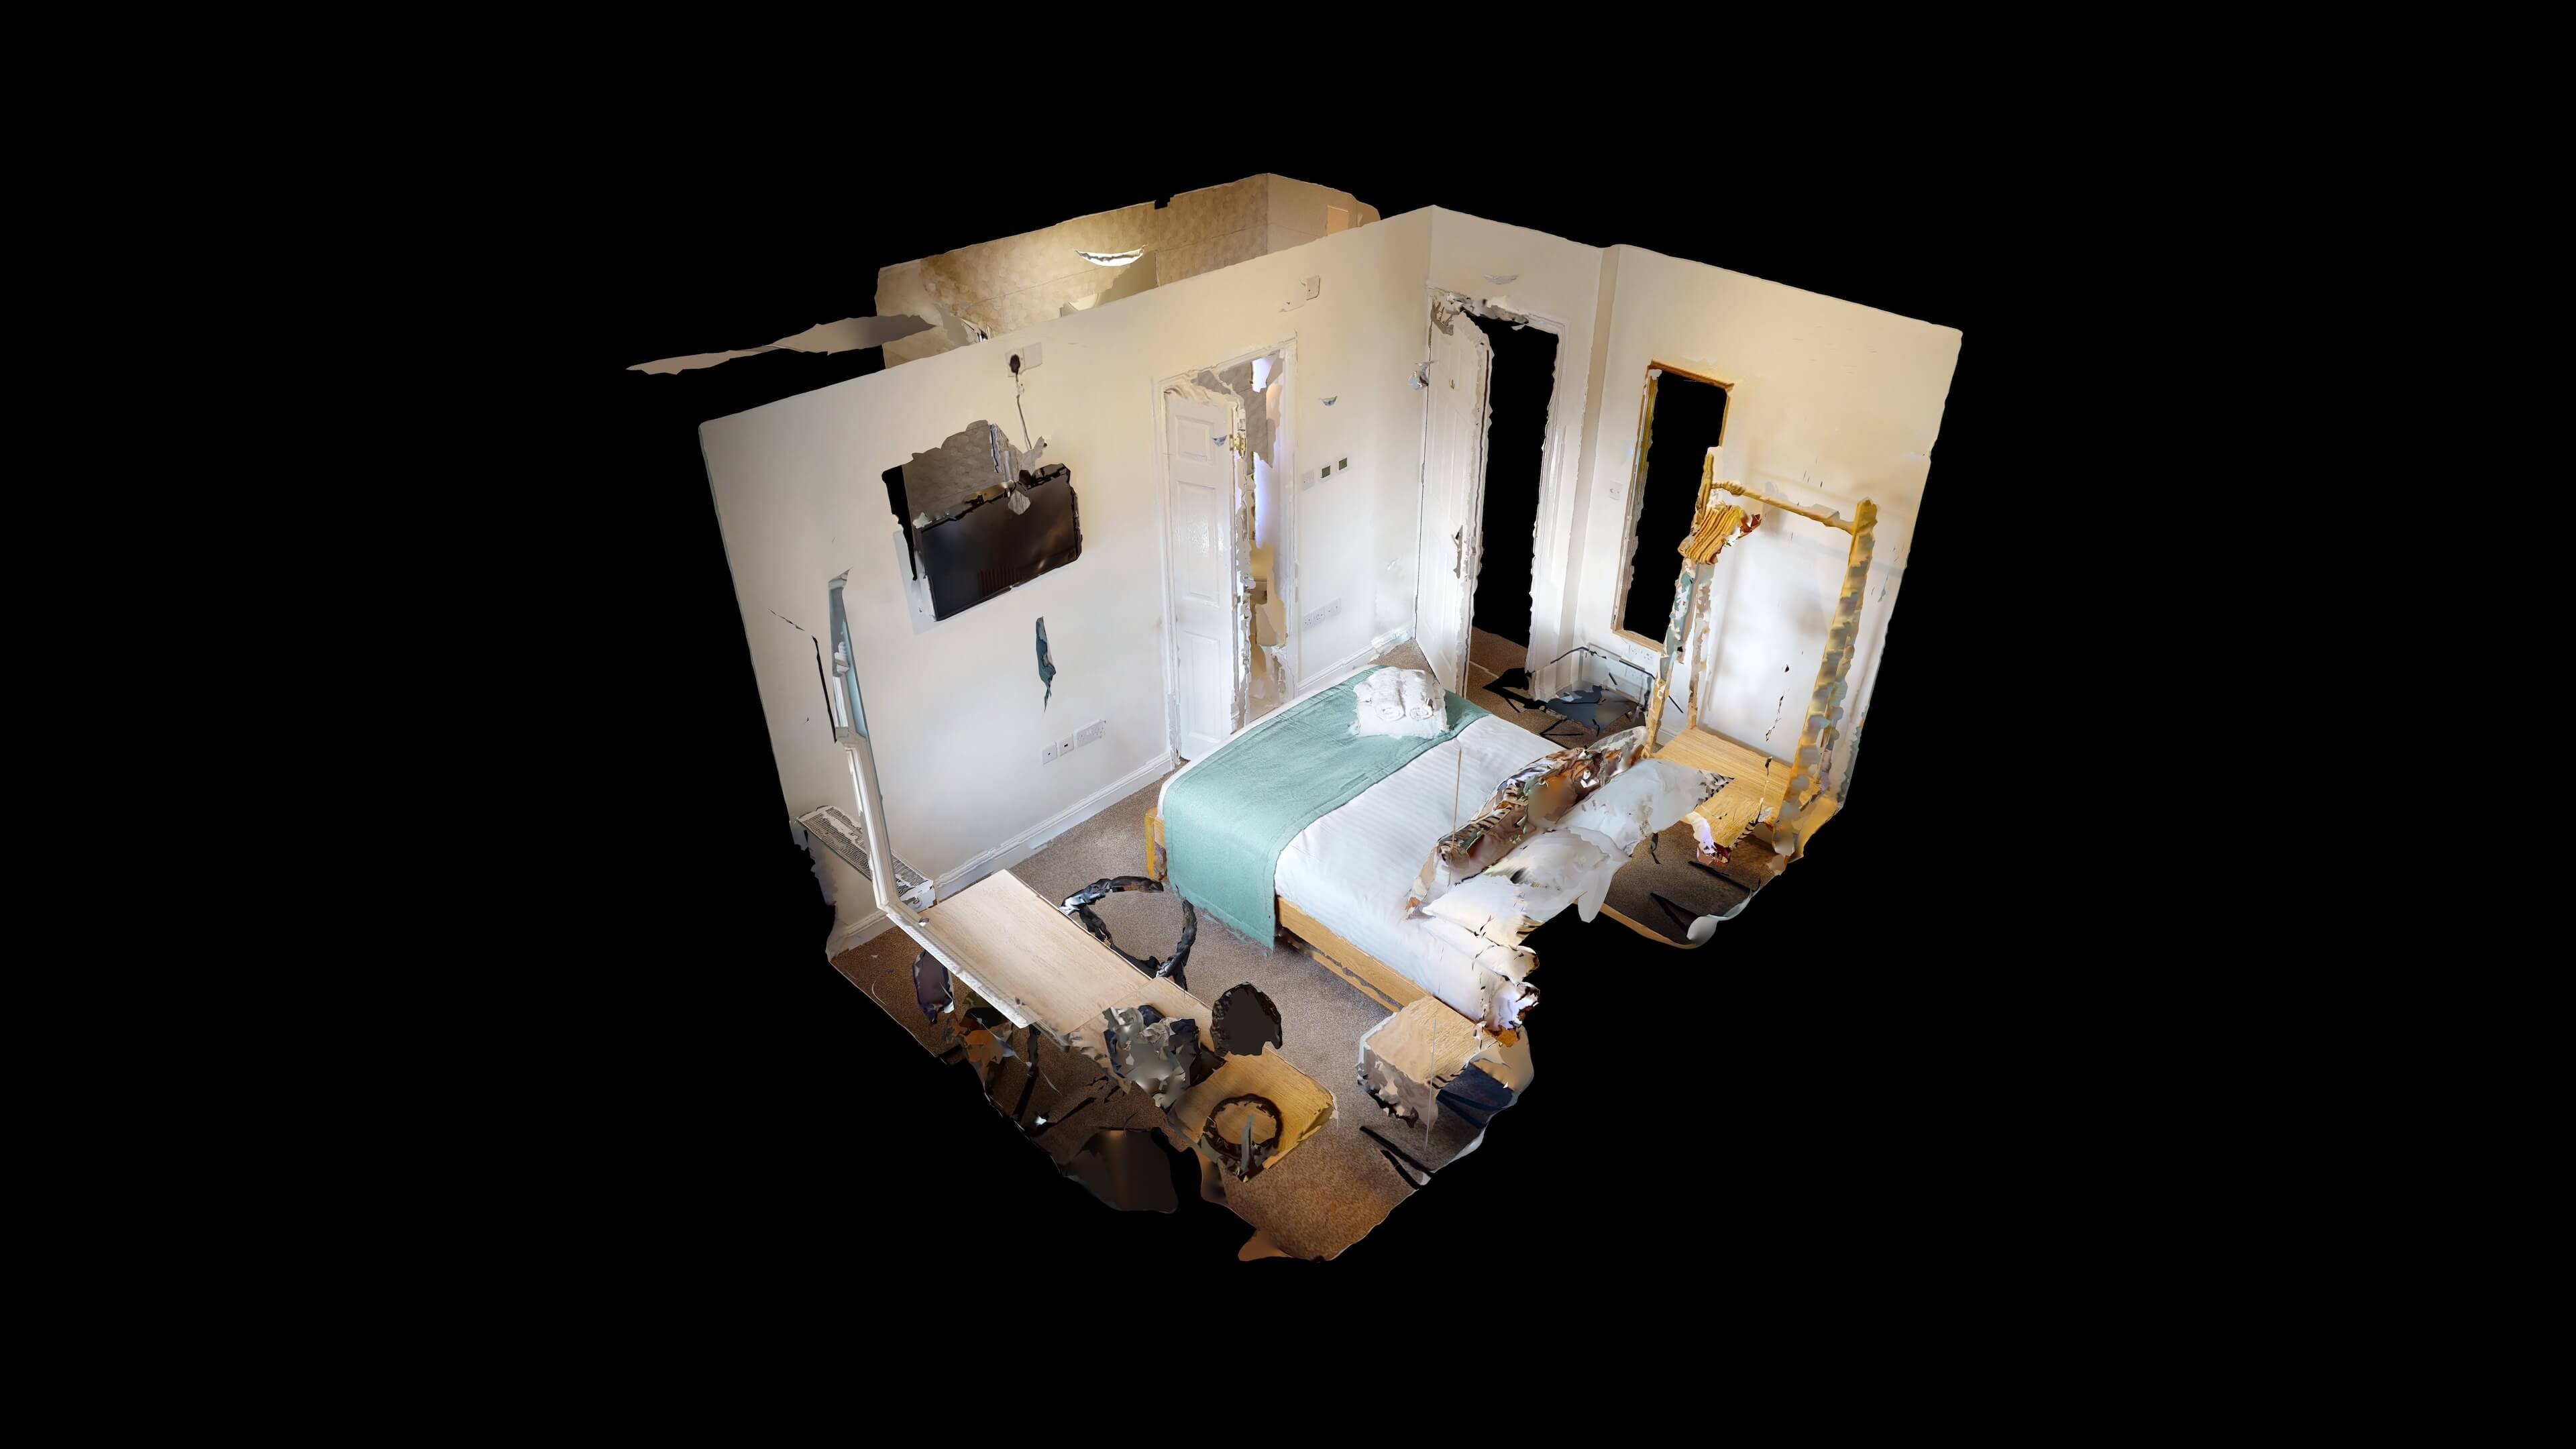 The Oxford Lodge Balliol Suite 4 The Oxford Lodge Balliol Suite Dollhouse View